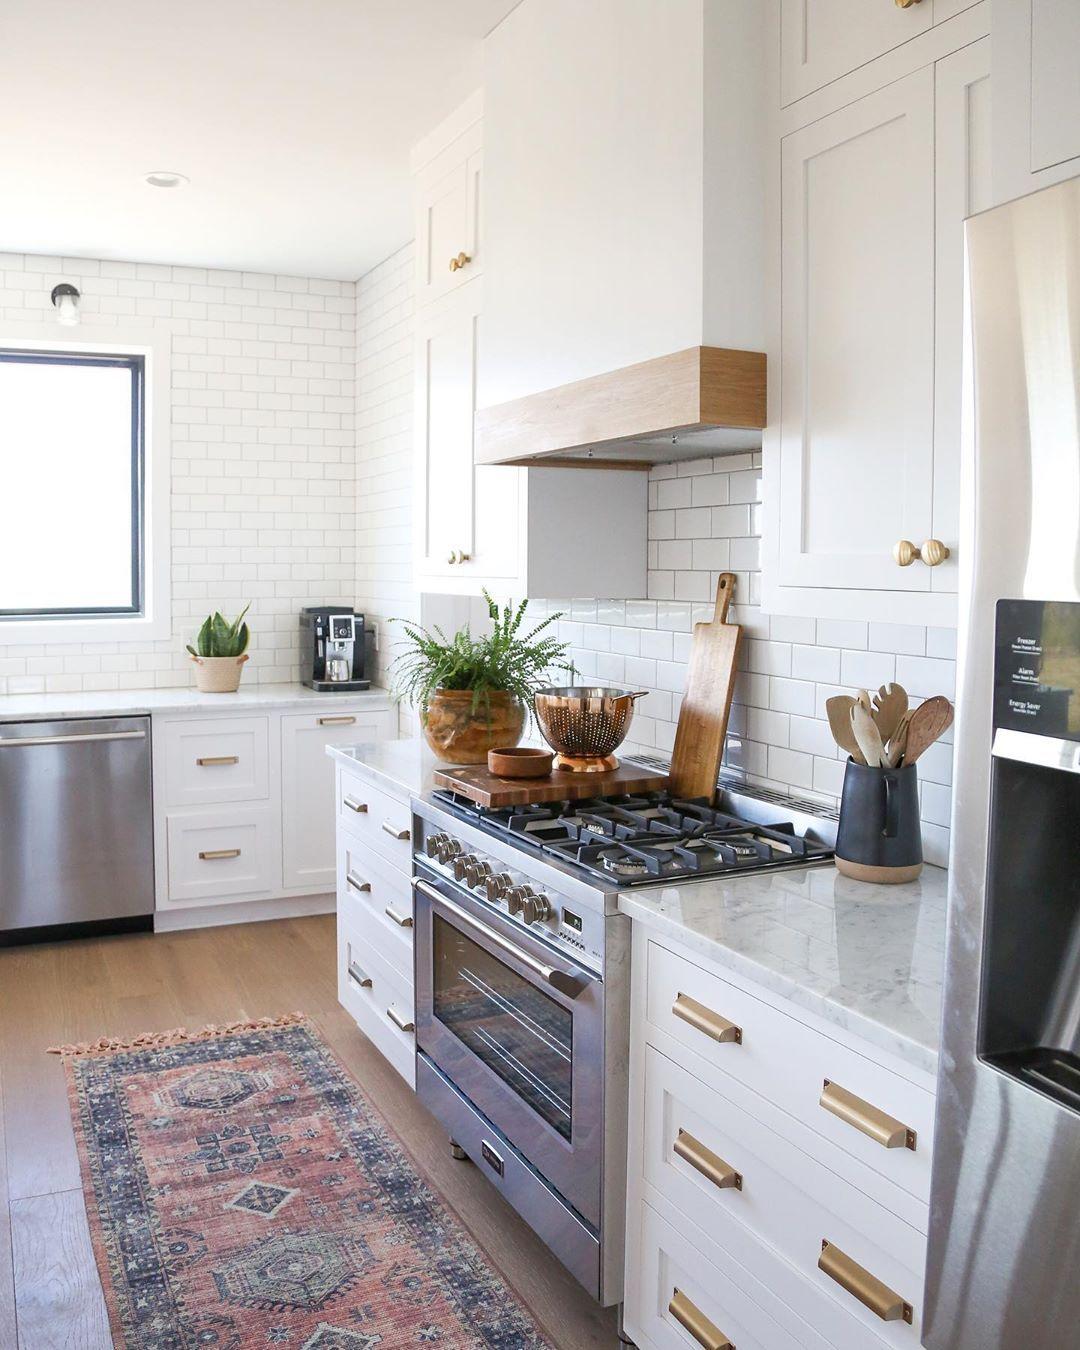 Kitchen from Joinery & Design Co. joineryanddesignco